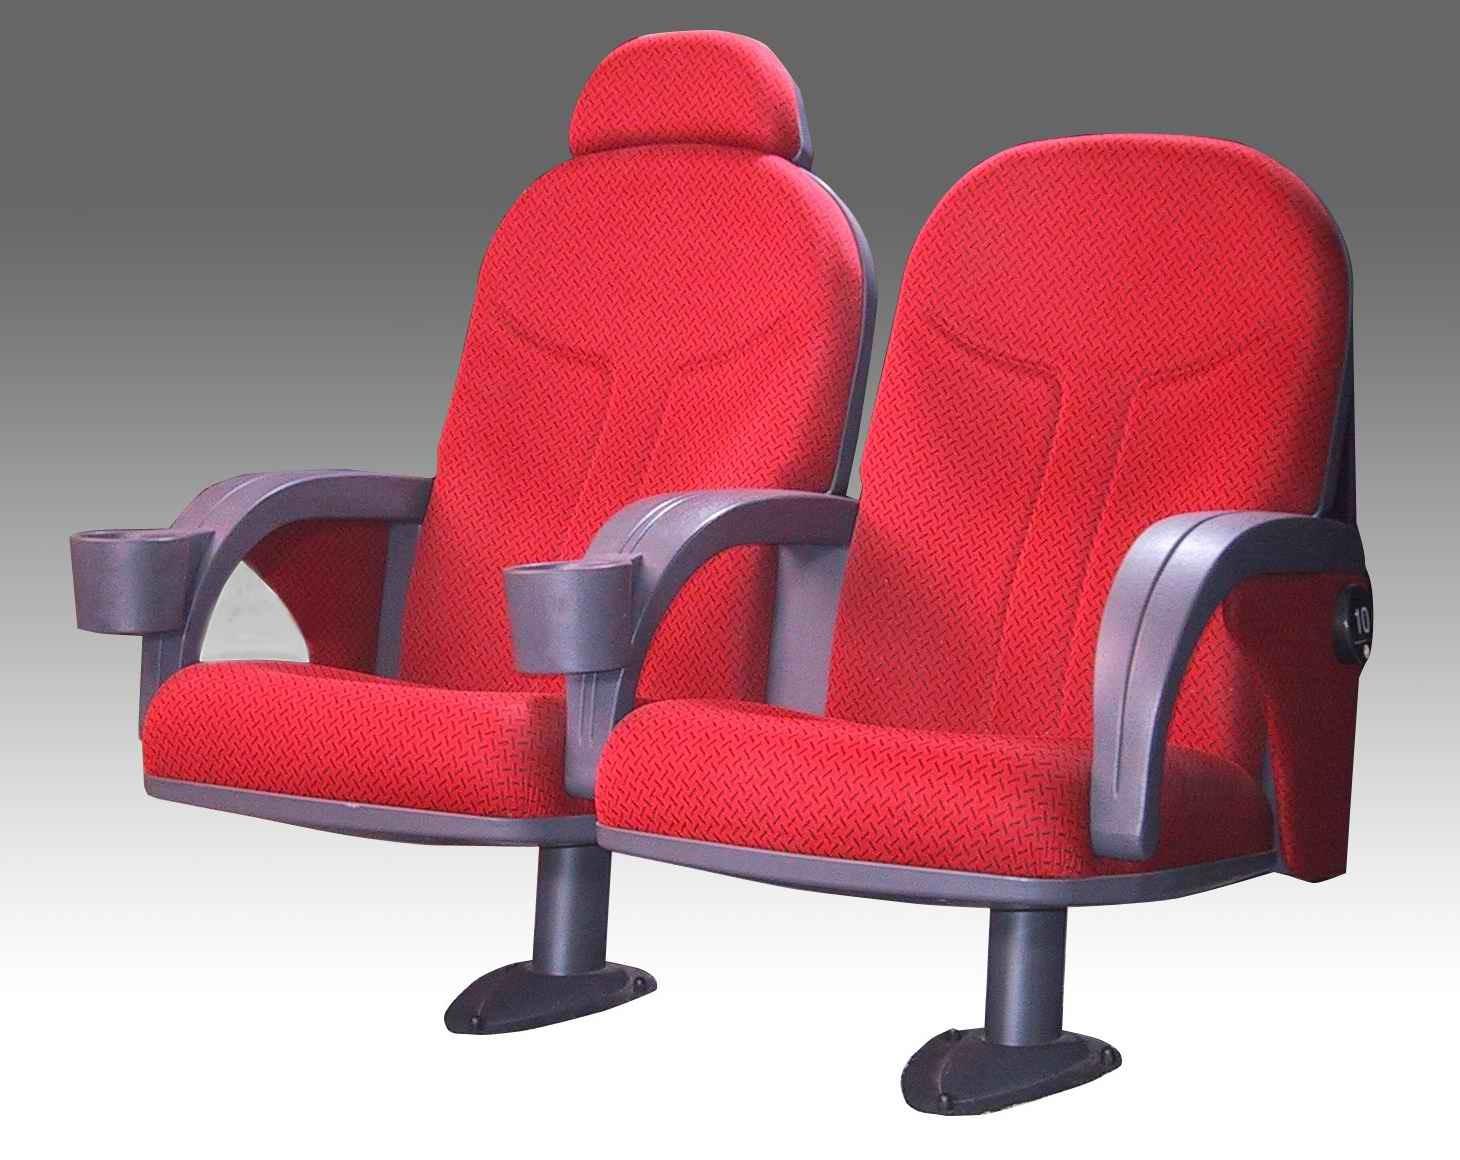 Cinema Seat Theater Chair Auditorium Seating (S20B)